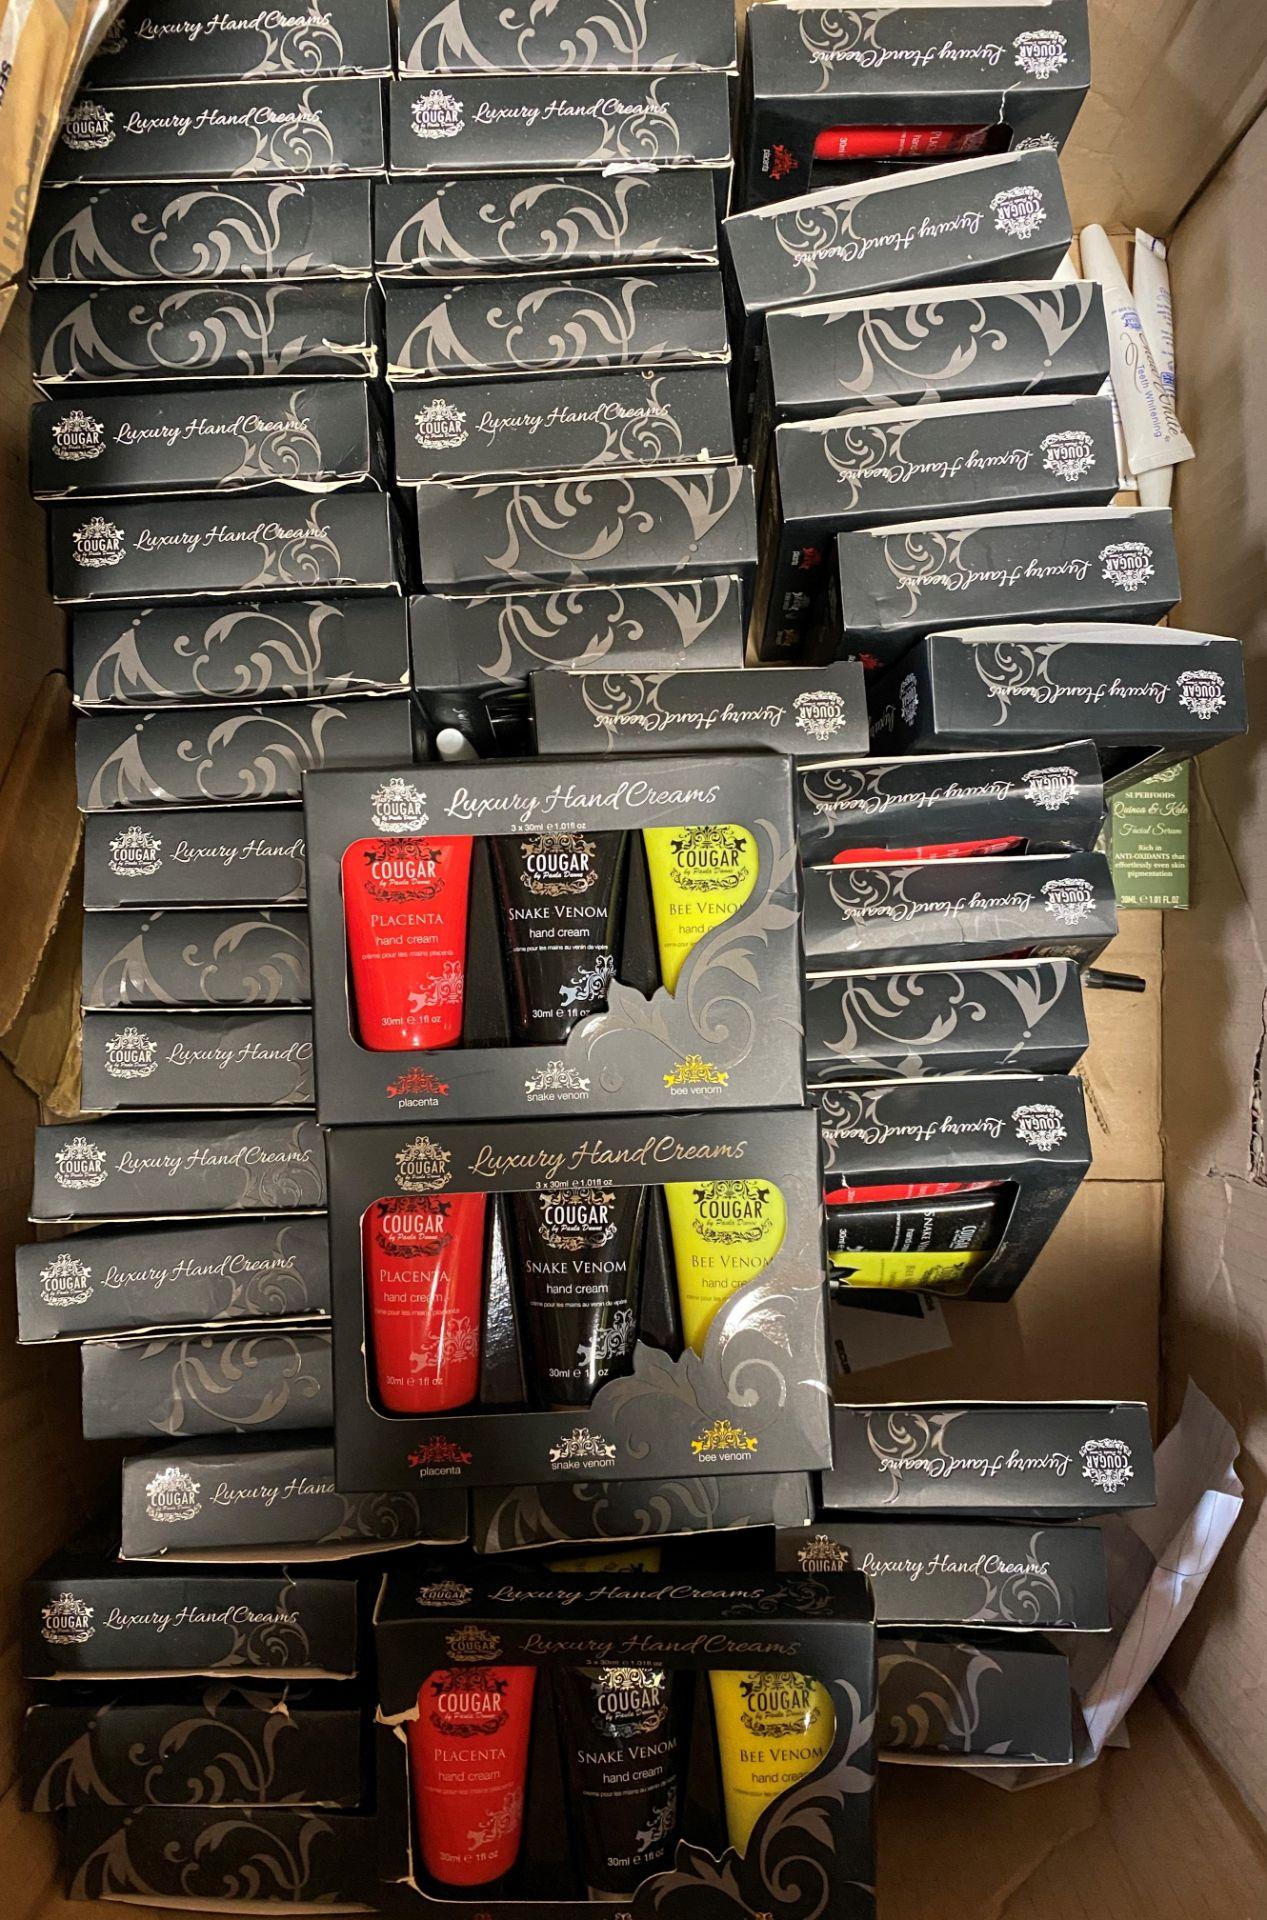 50 x Cougar Luxury Hand Cream sets - 3 x 30ml tubes in each inc.